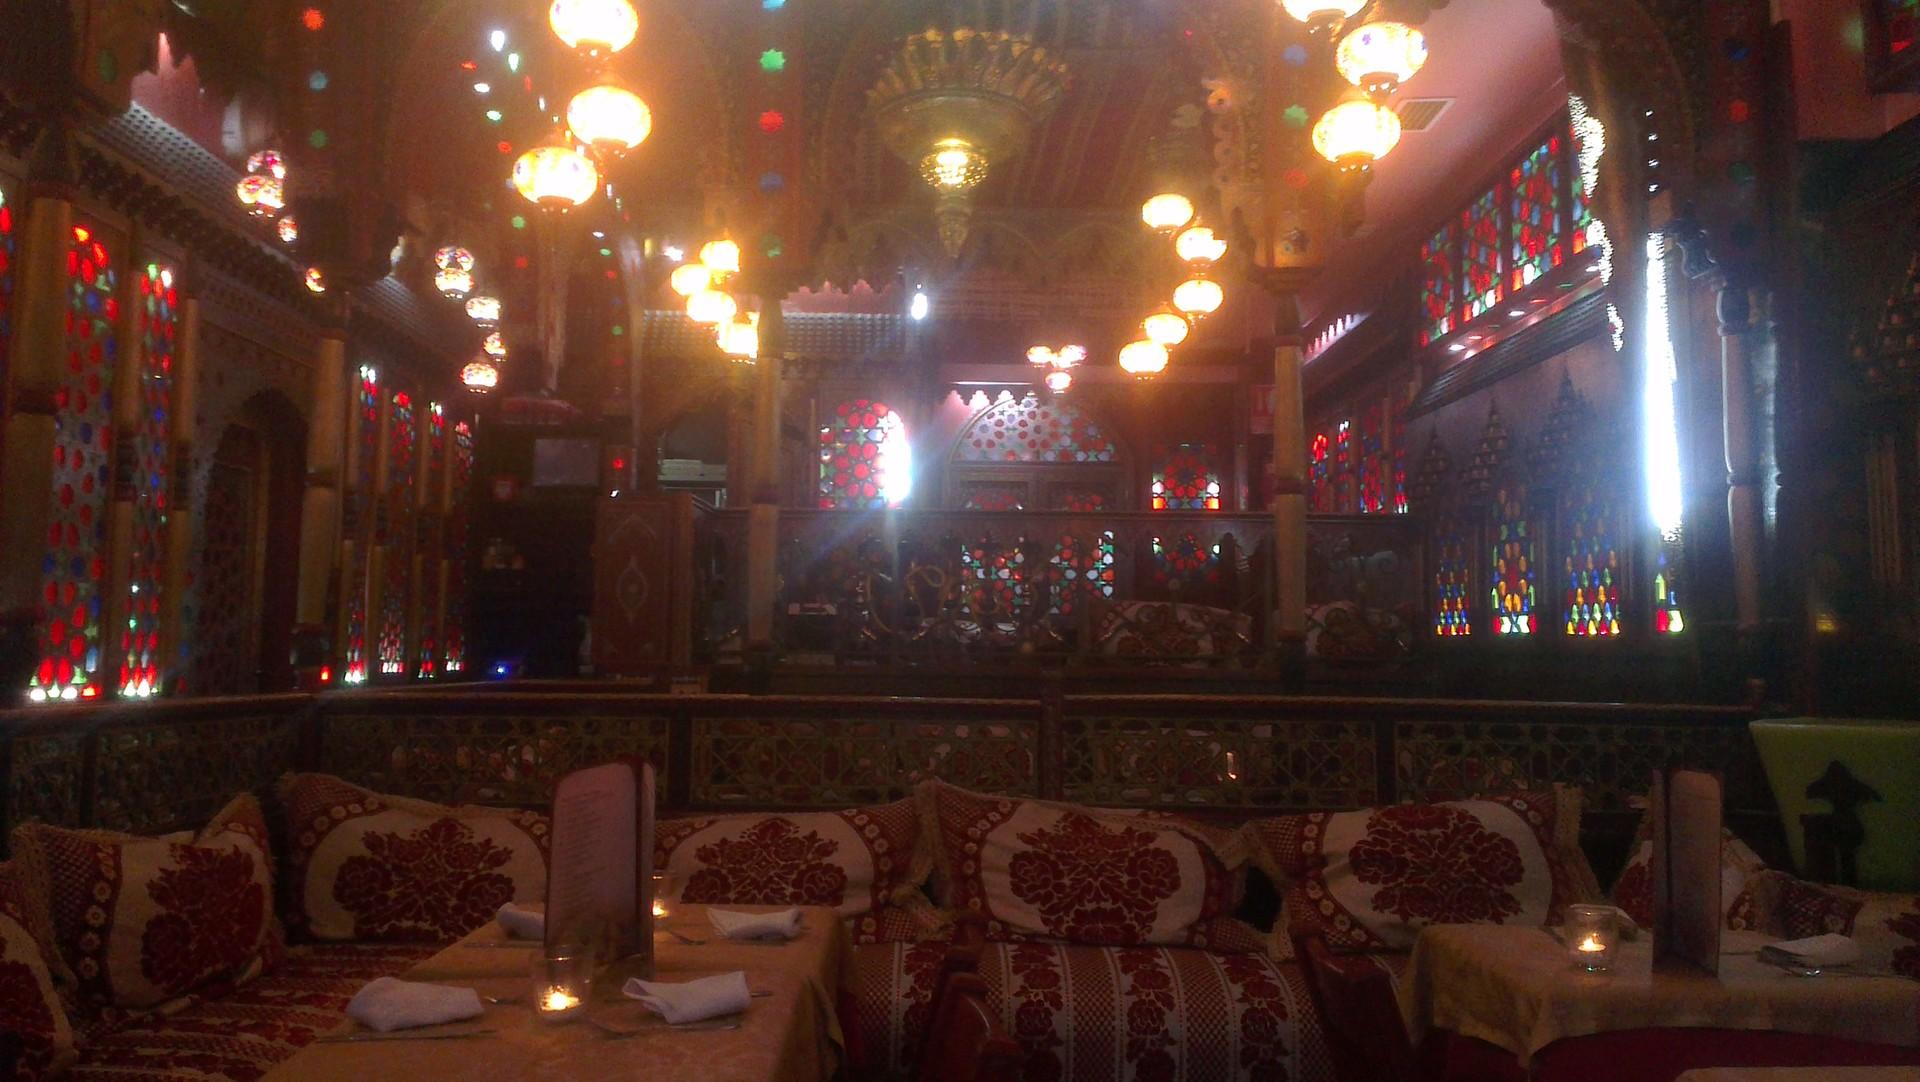 cuisine-marocaine-a-grenade-a6b3b70e0b6f